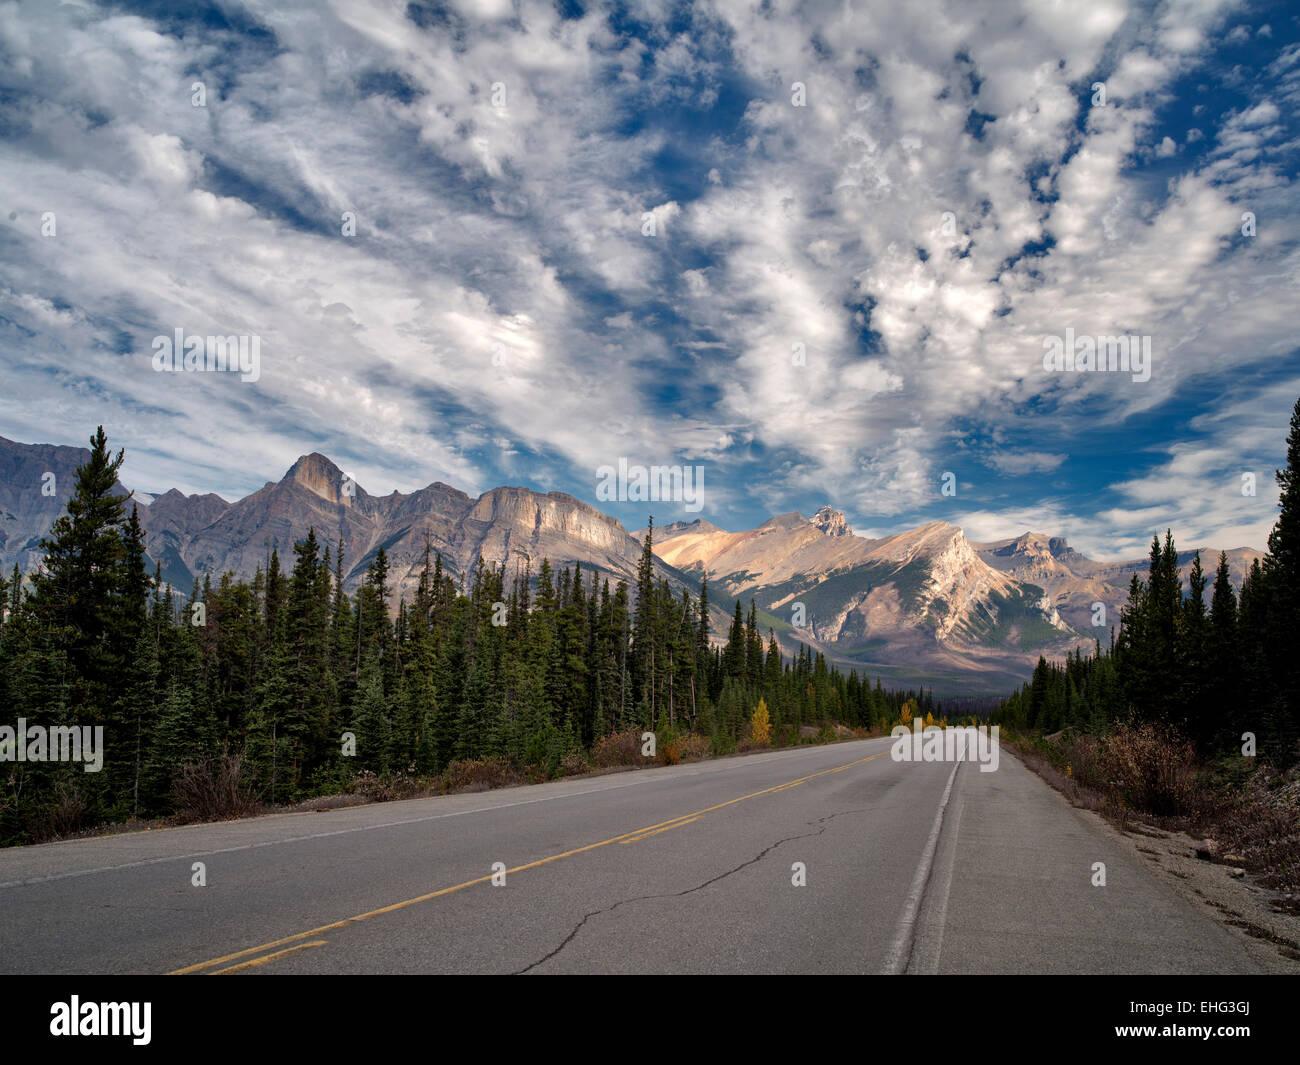 Road, dans le parc national Banff, Alberta, Canada Banque D'Images